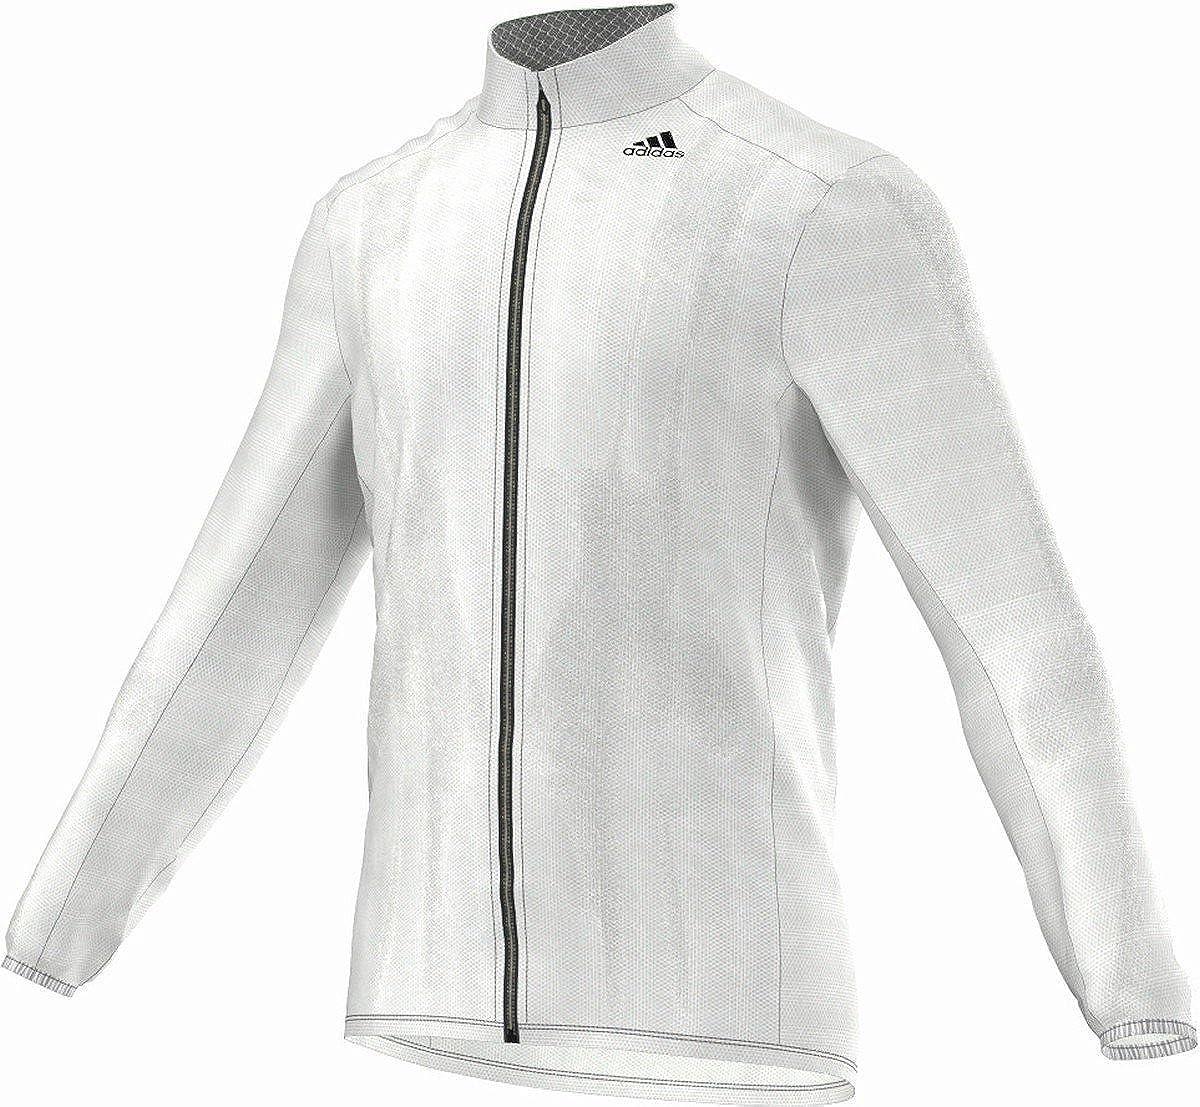 adidas AZ Ghost Jkt M - Chándal para Hombre, Color Blanco/Negro ...